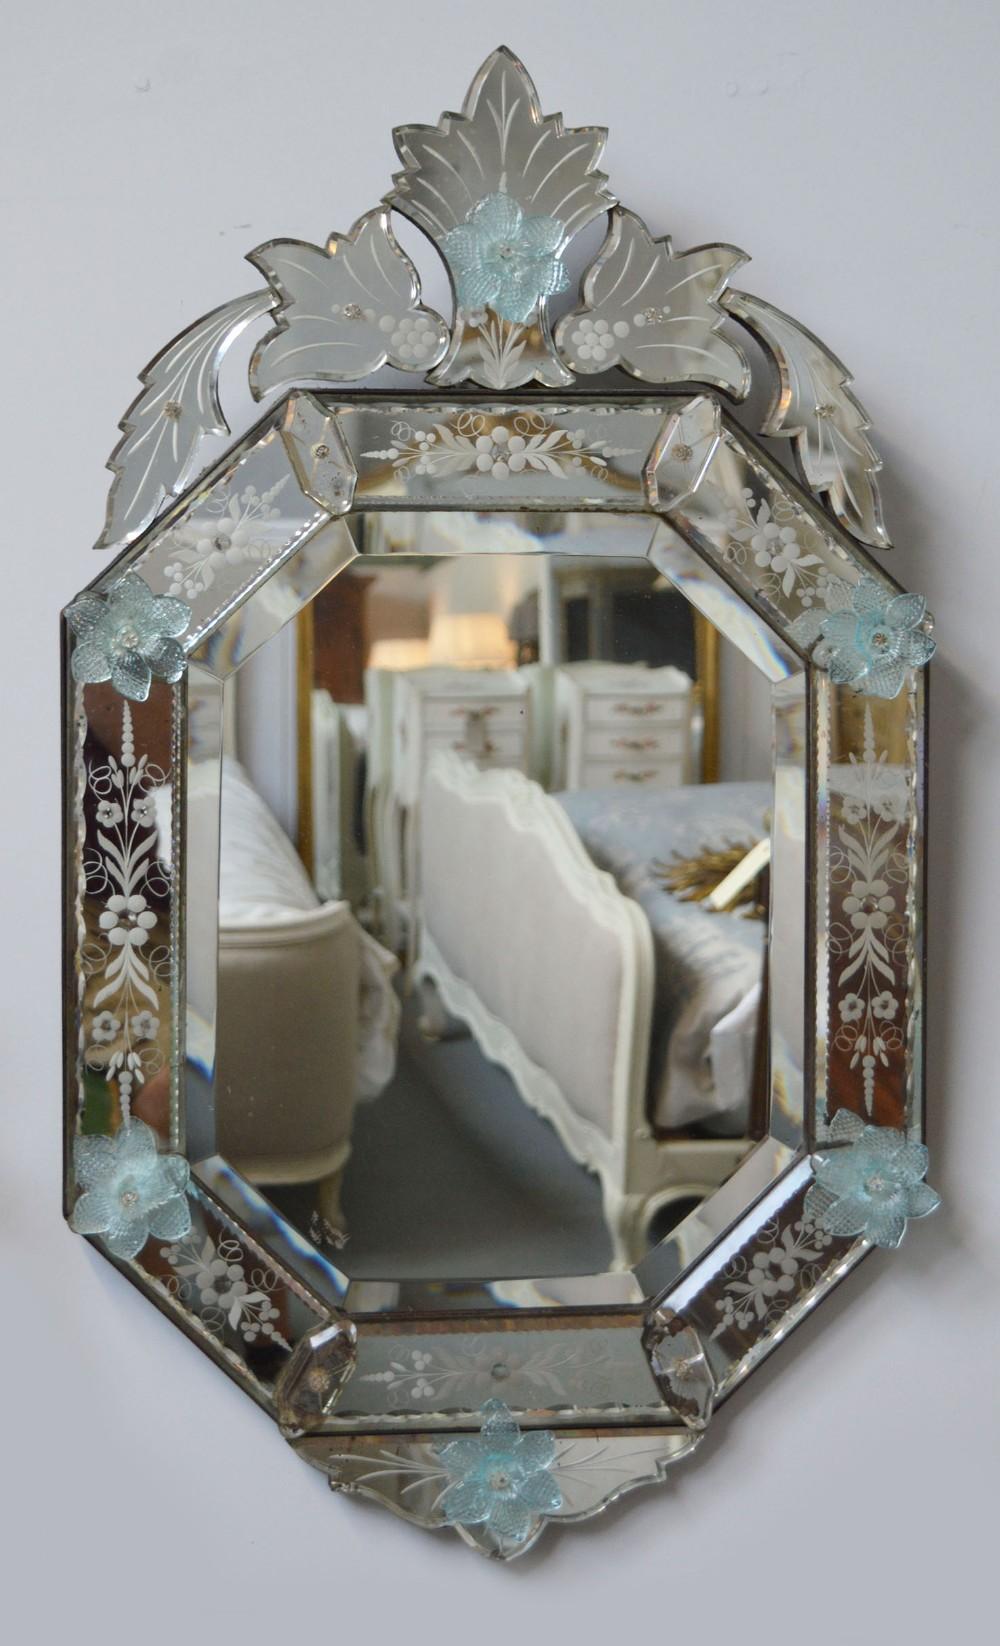 Early 20th Century Venetian Wall Mirror 674397 Sellingantiques Co Uk